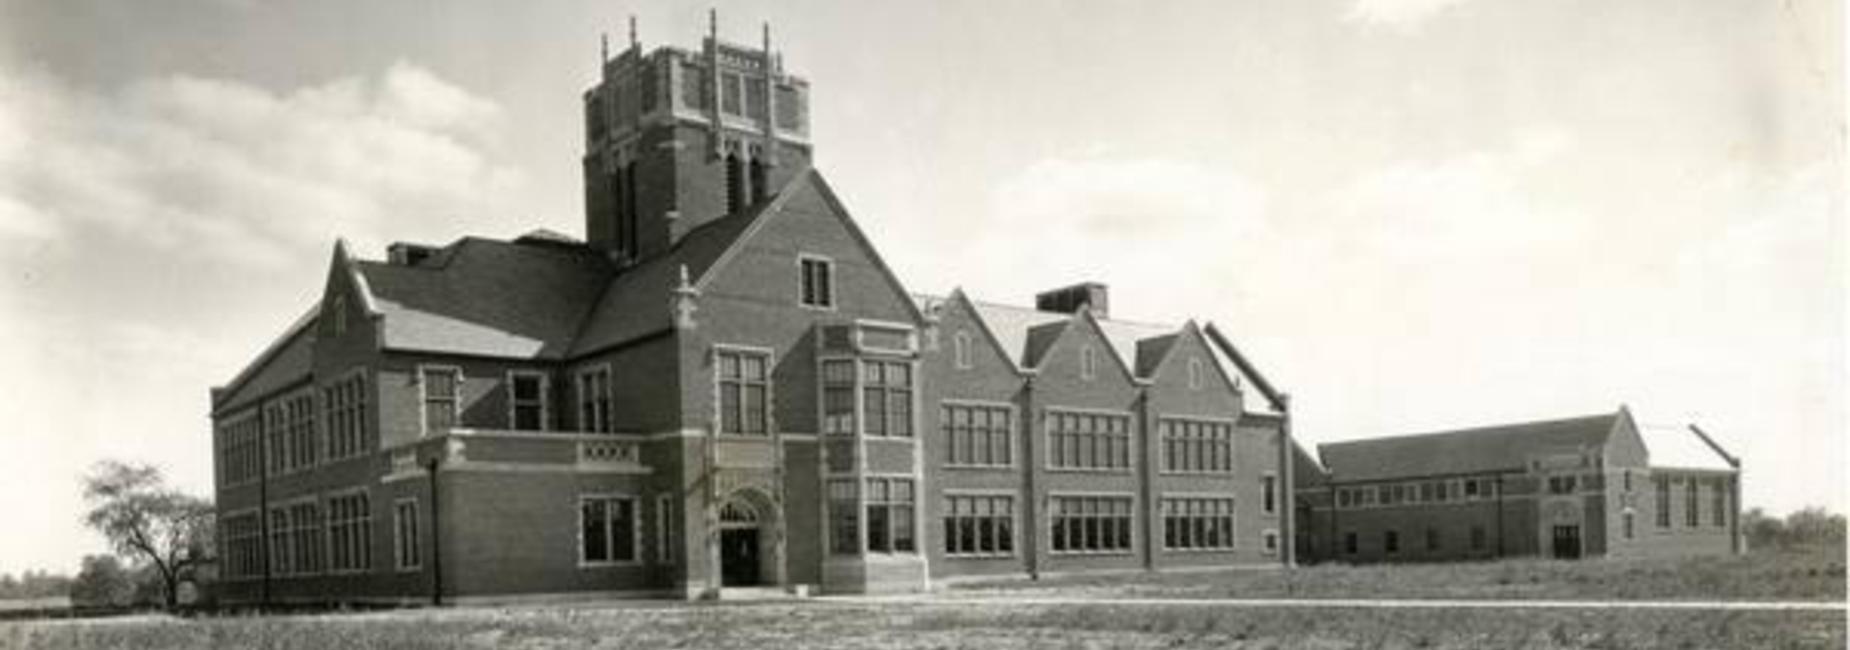 Test School 1920